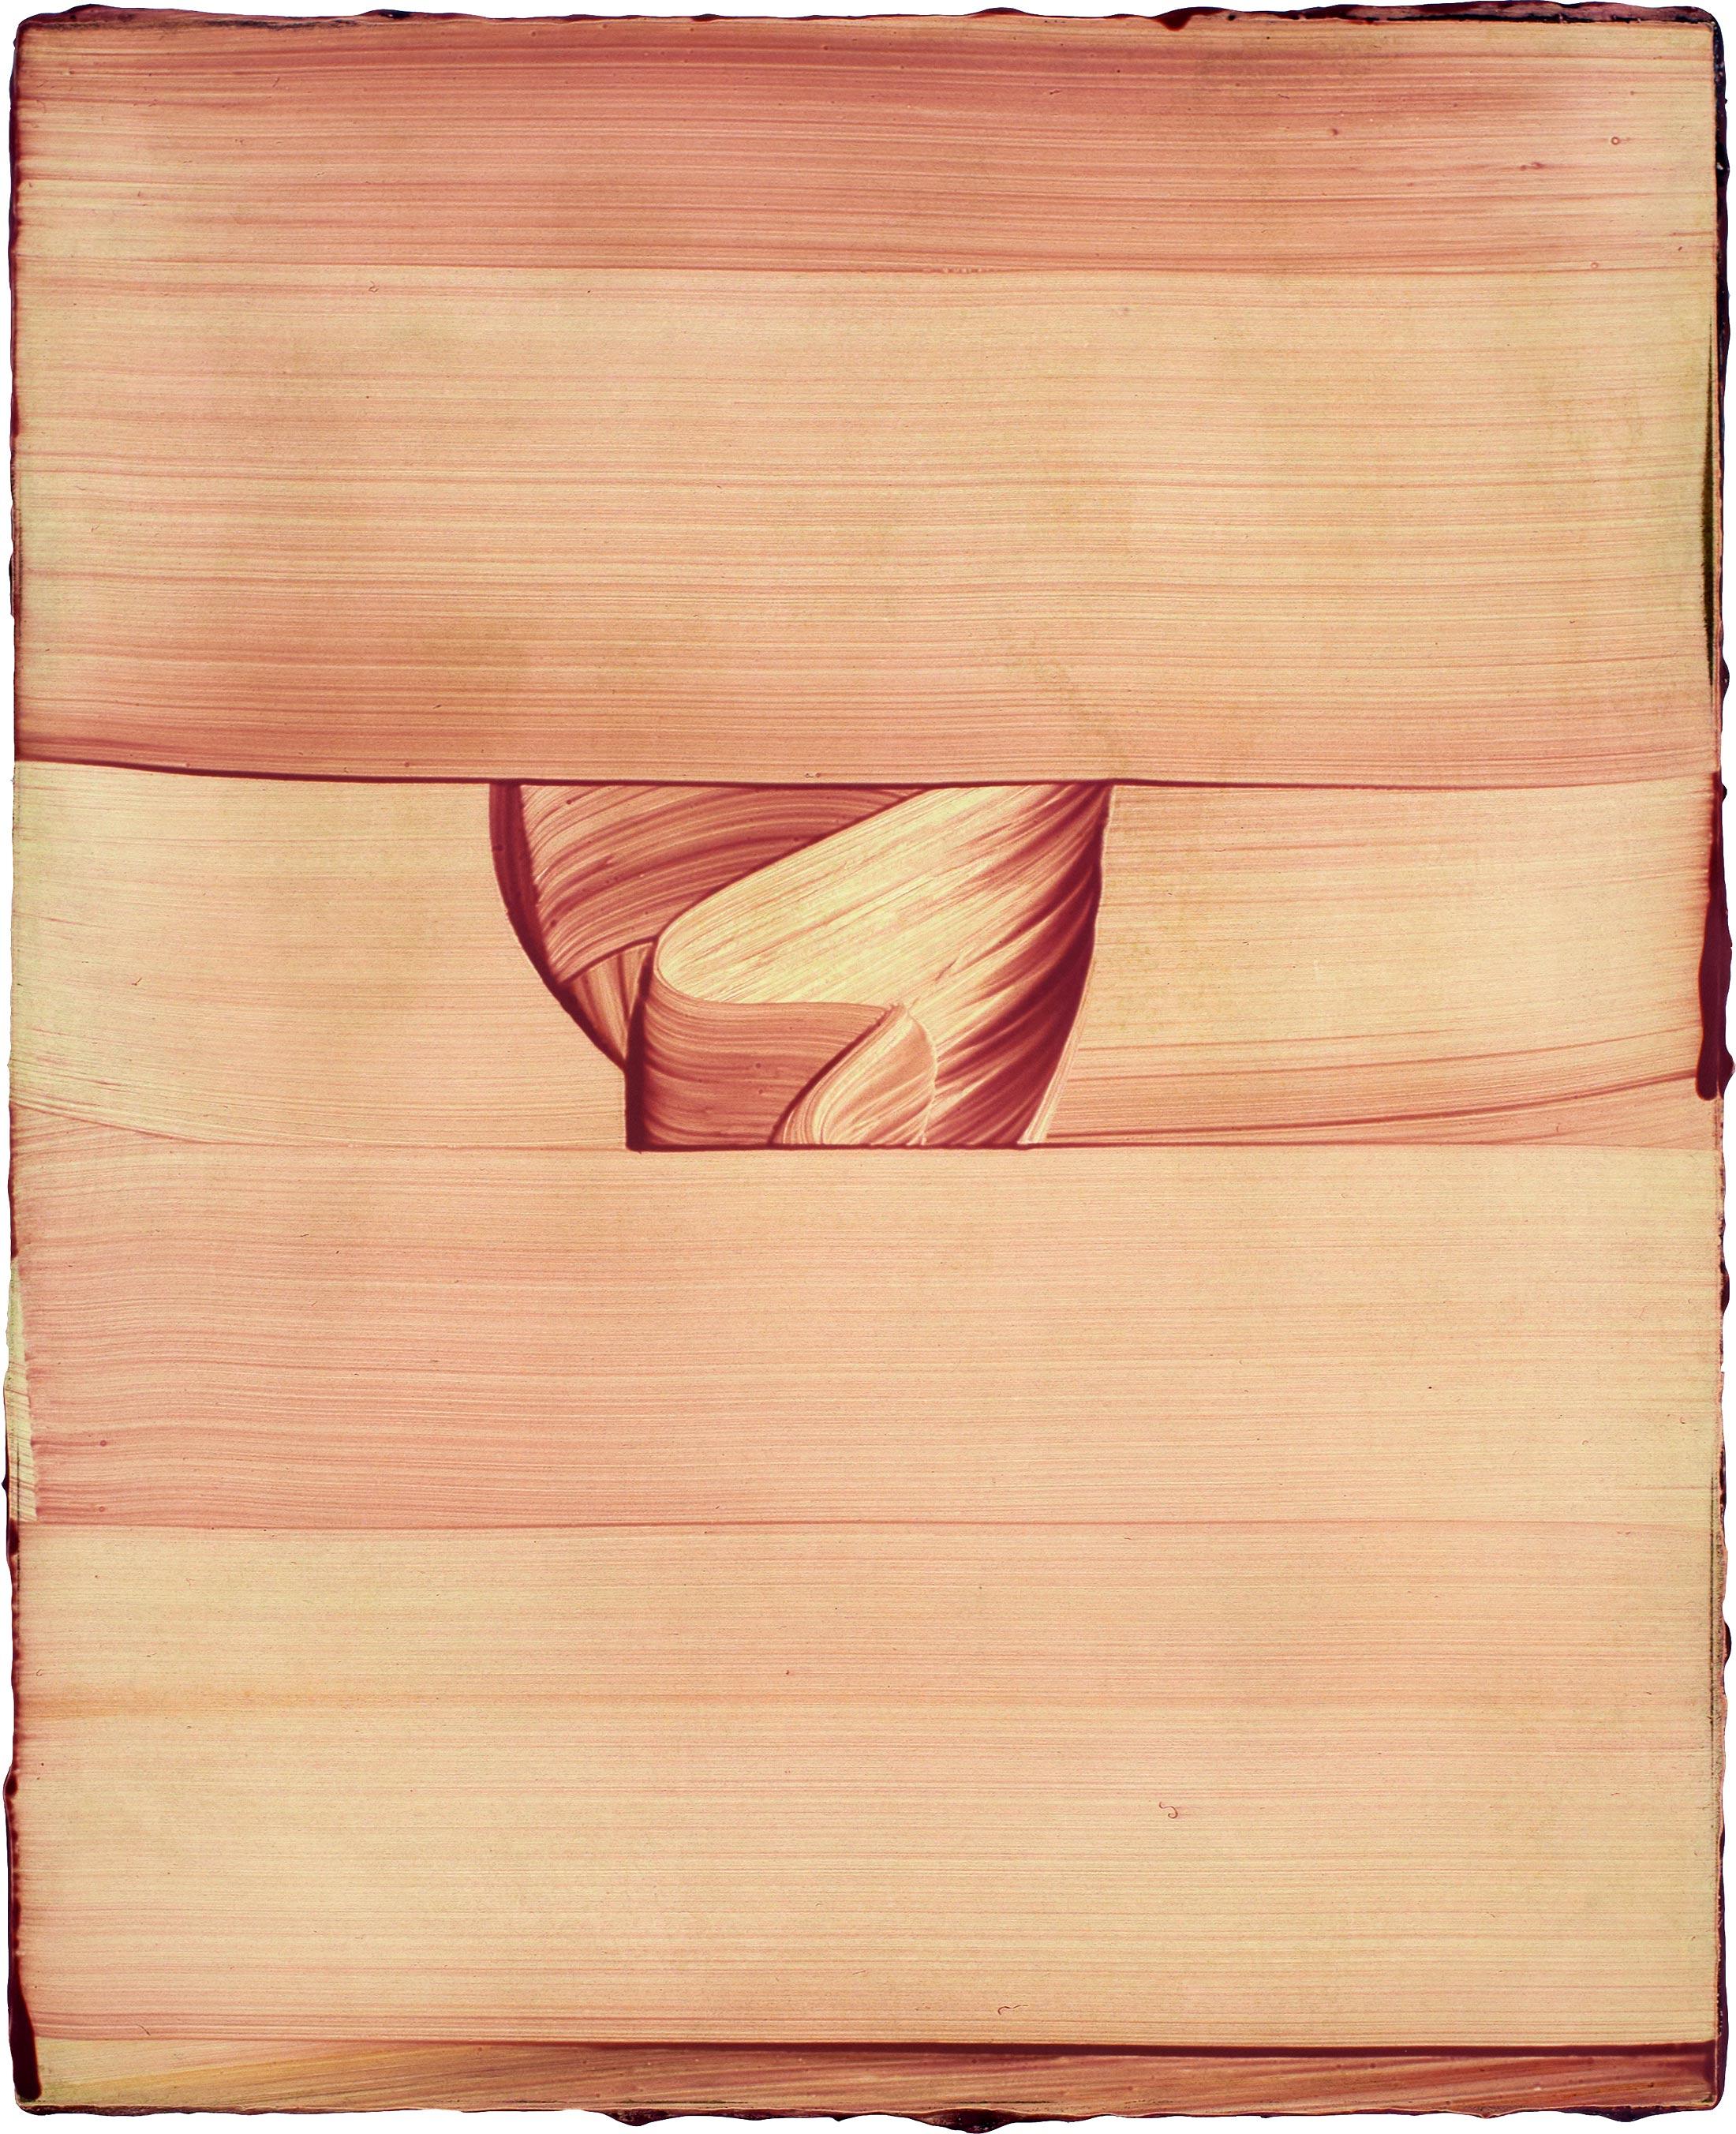 abstract, contemporary art, germany, fine arts